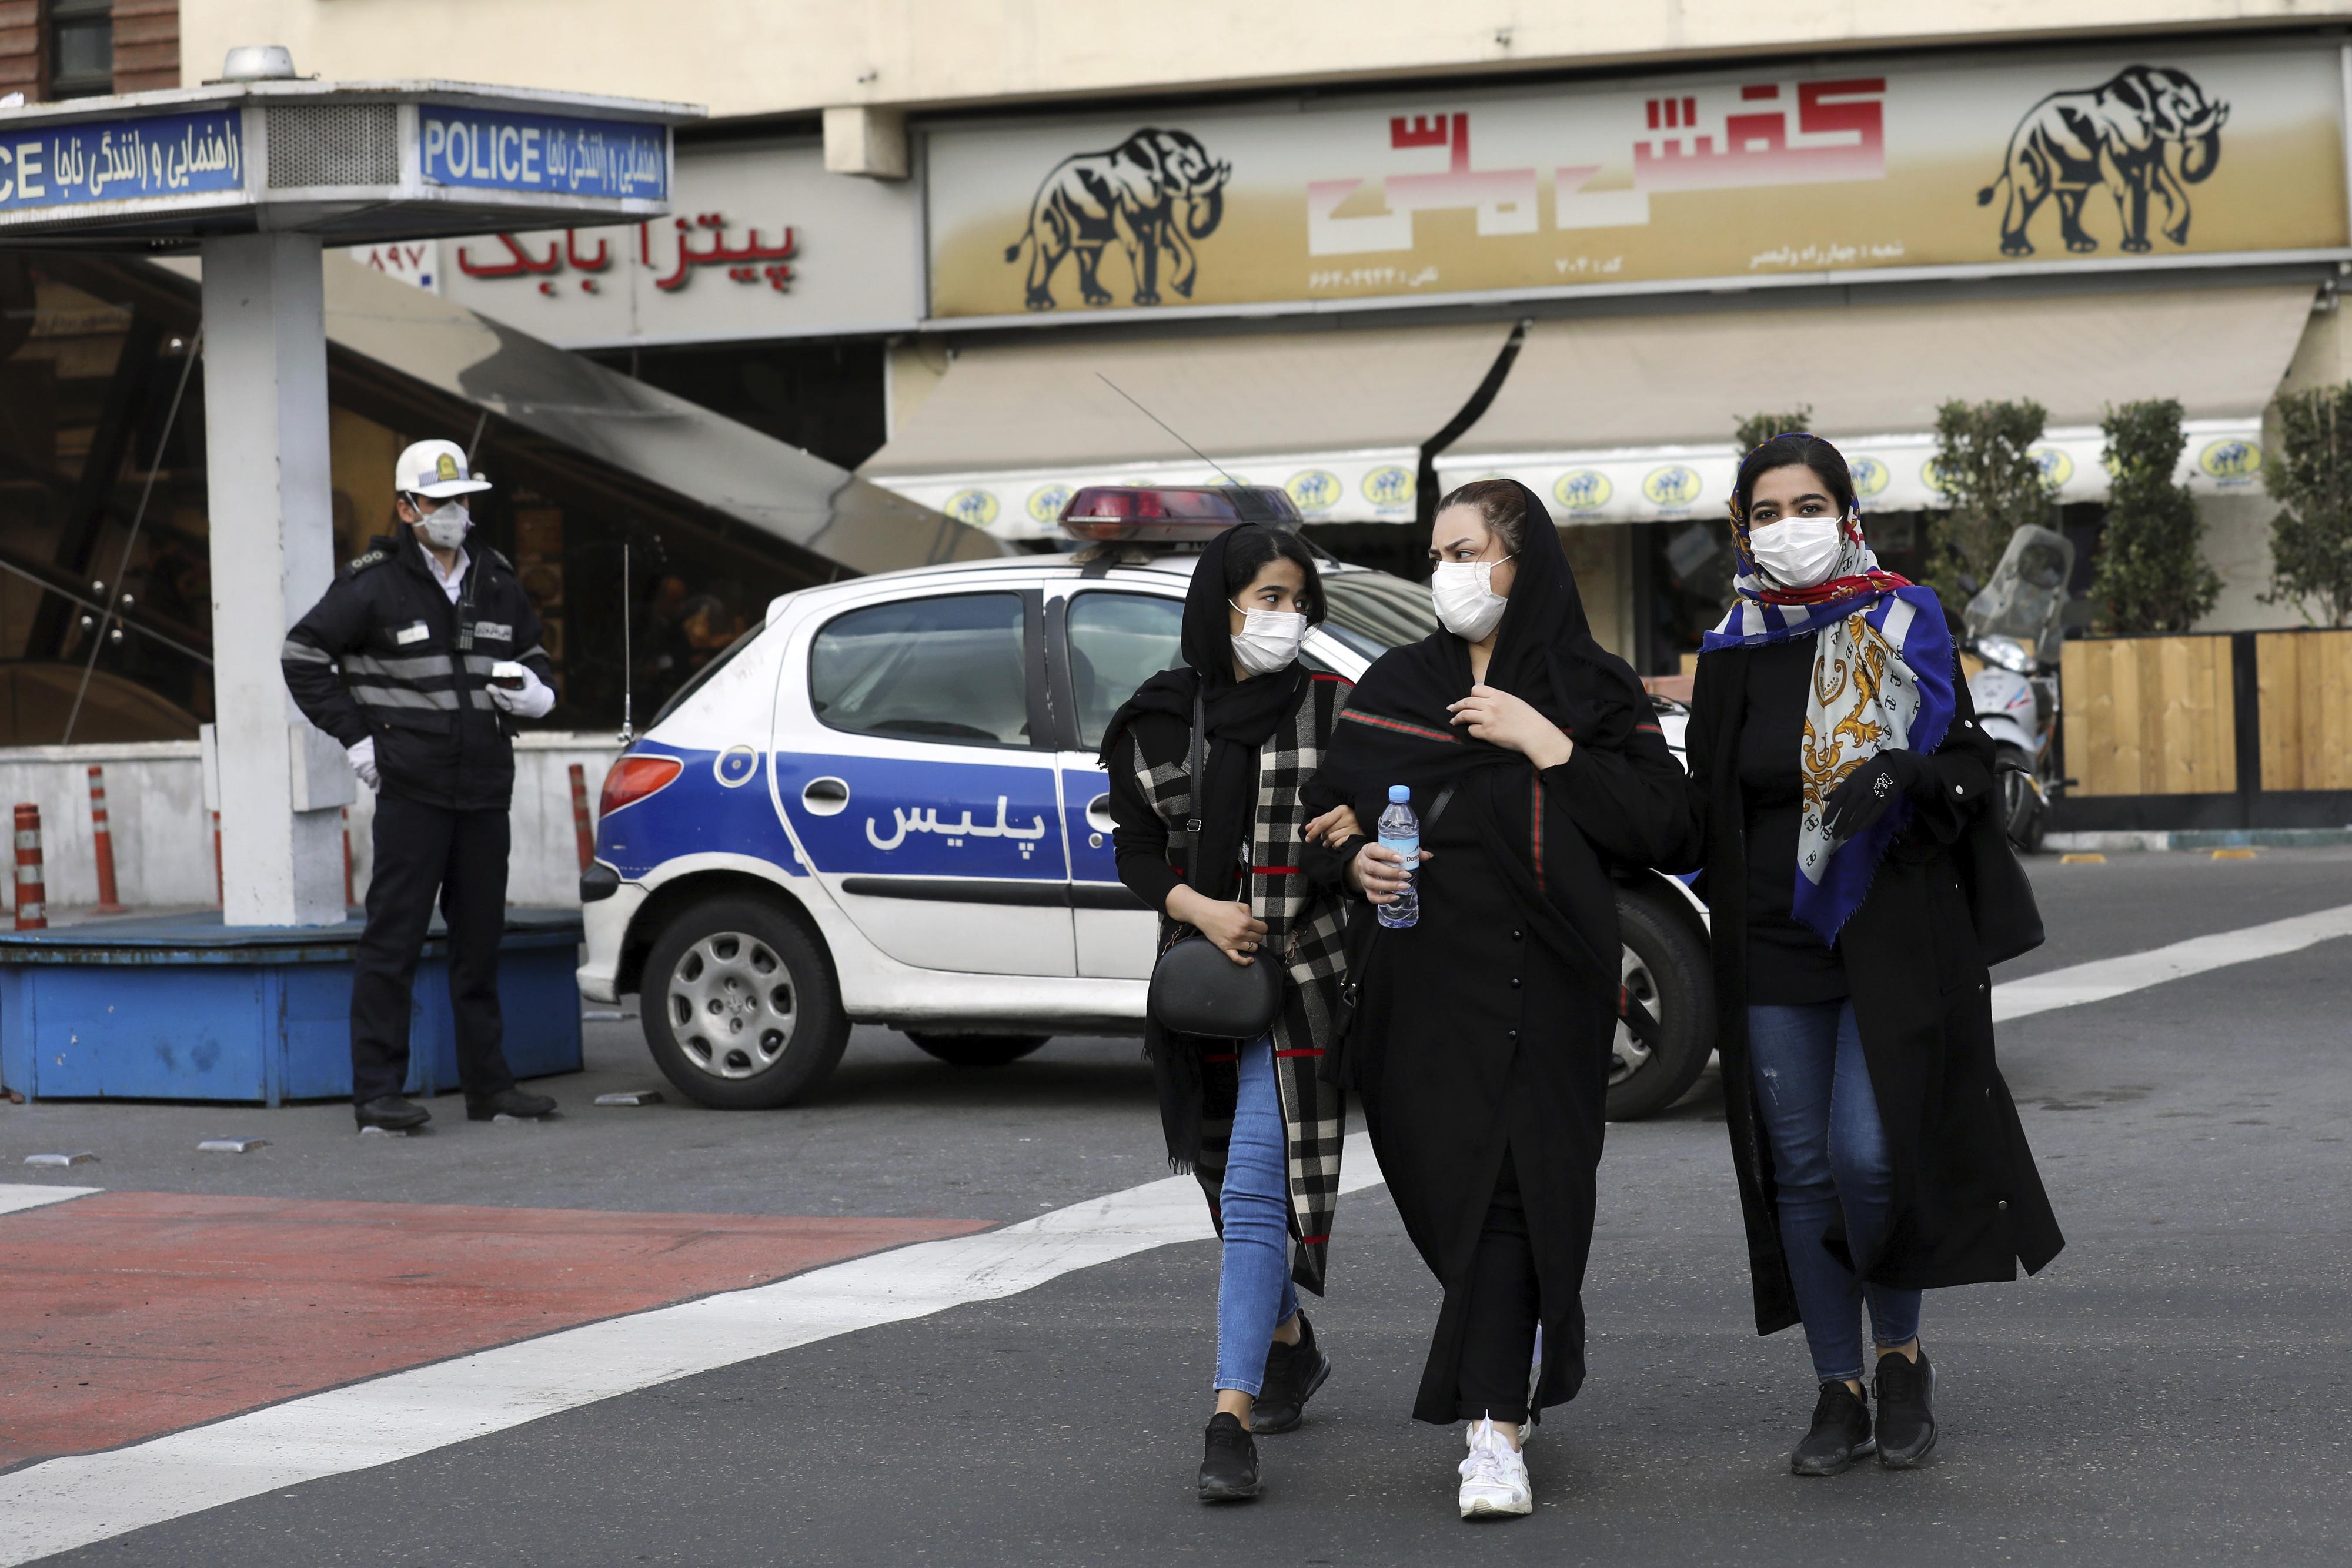 A policeman and pedestrians wear masks in Tehran, Iran, on Feb. 23, 2020.